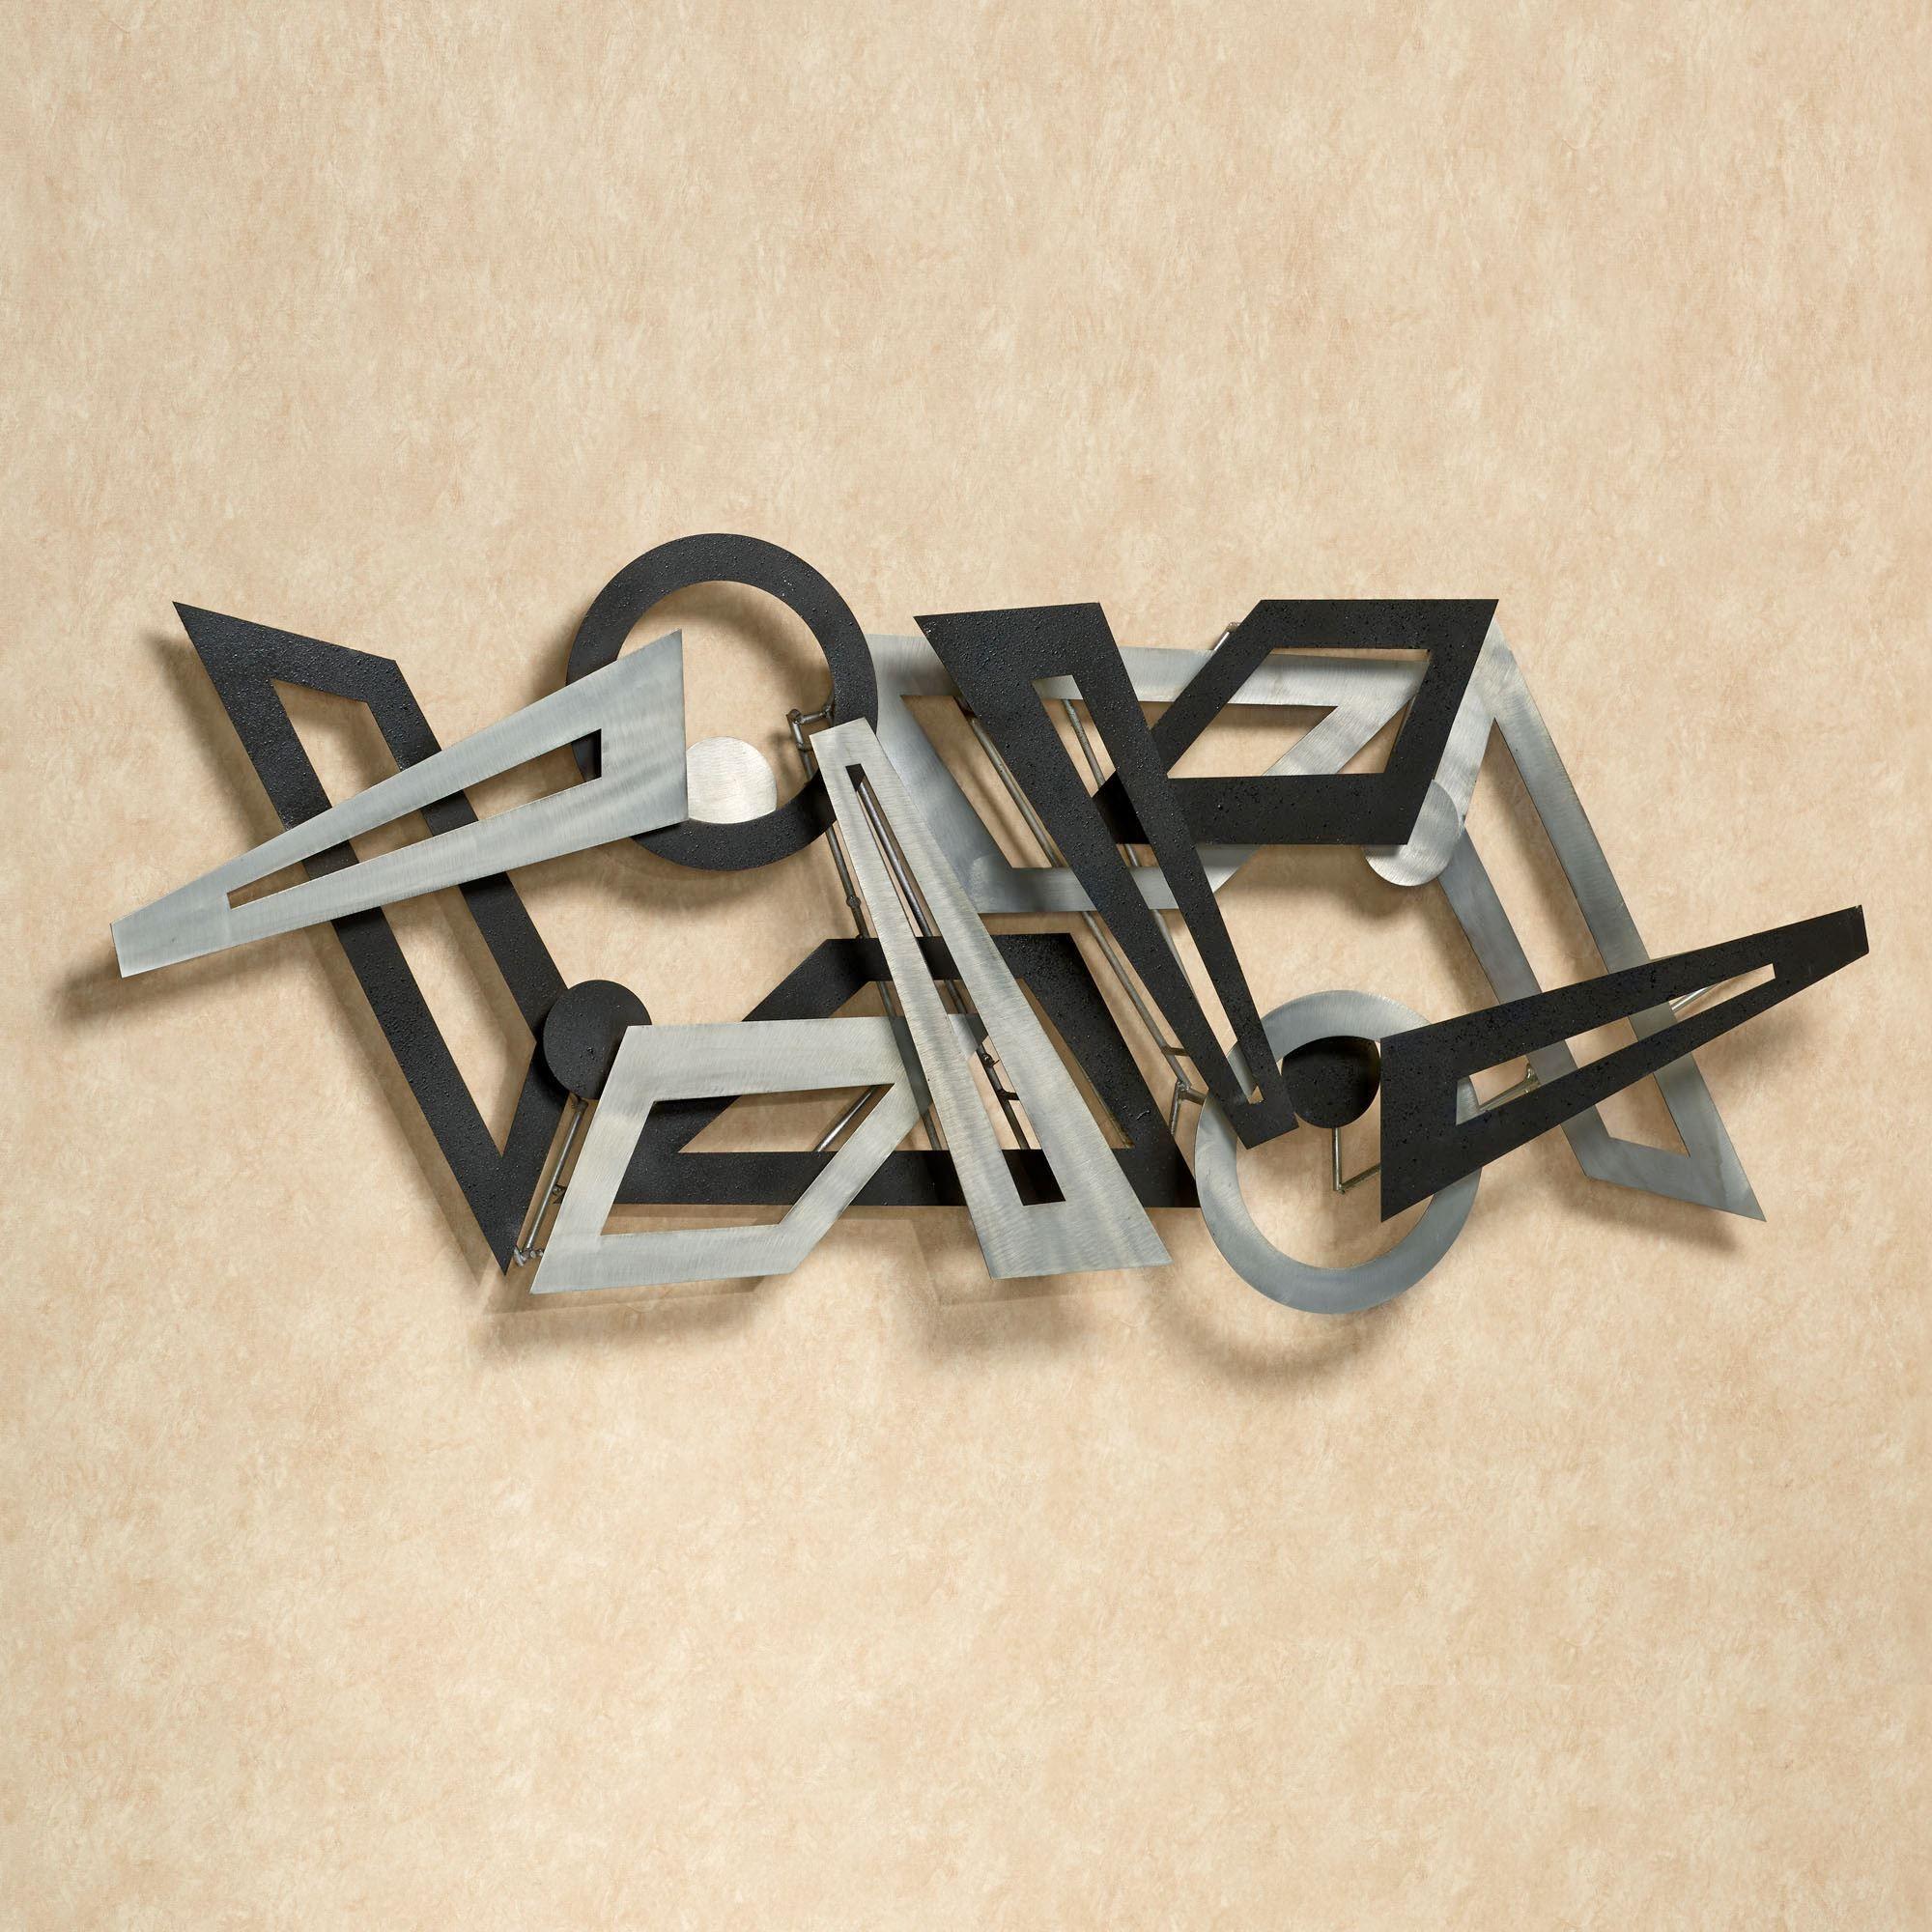 Metal Wall Sculpture Reciprocal Abstract Metal Wall Sculpturejasonw Studios